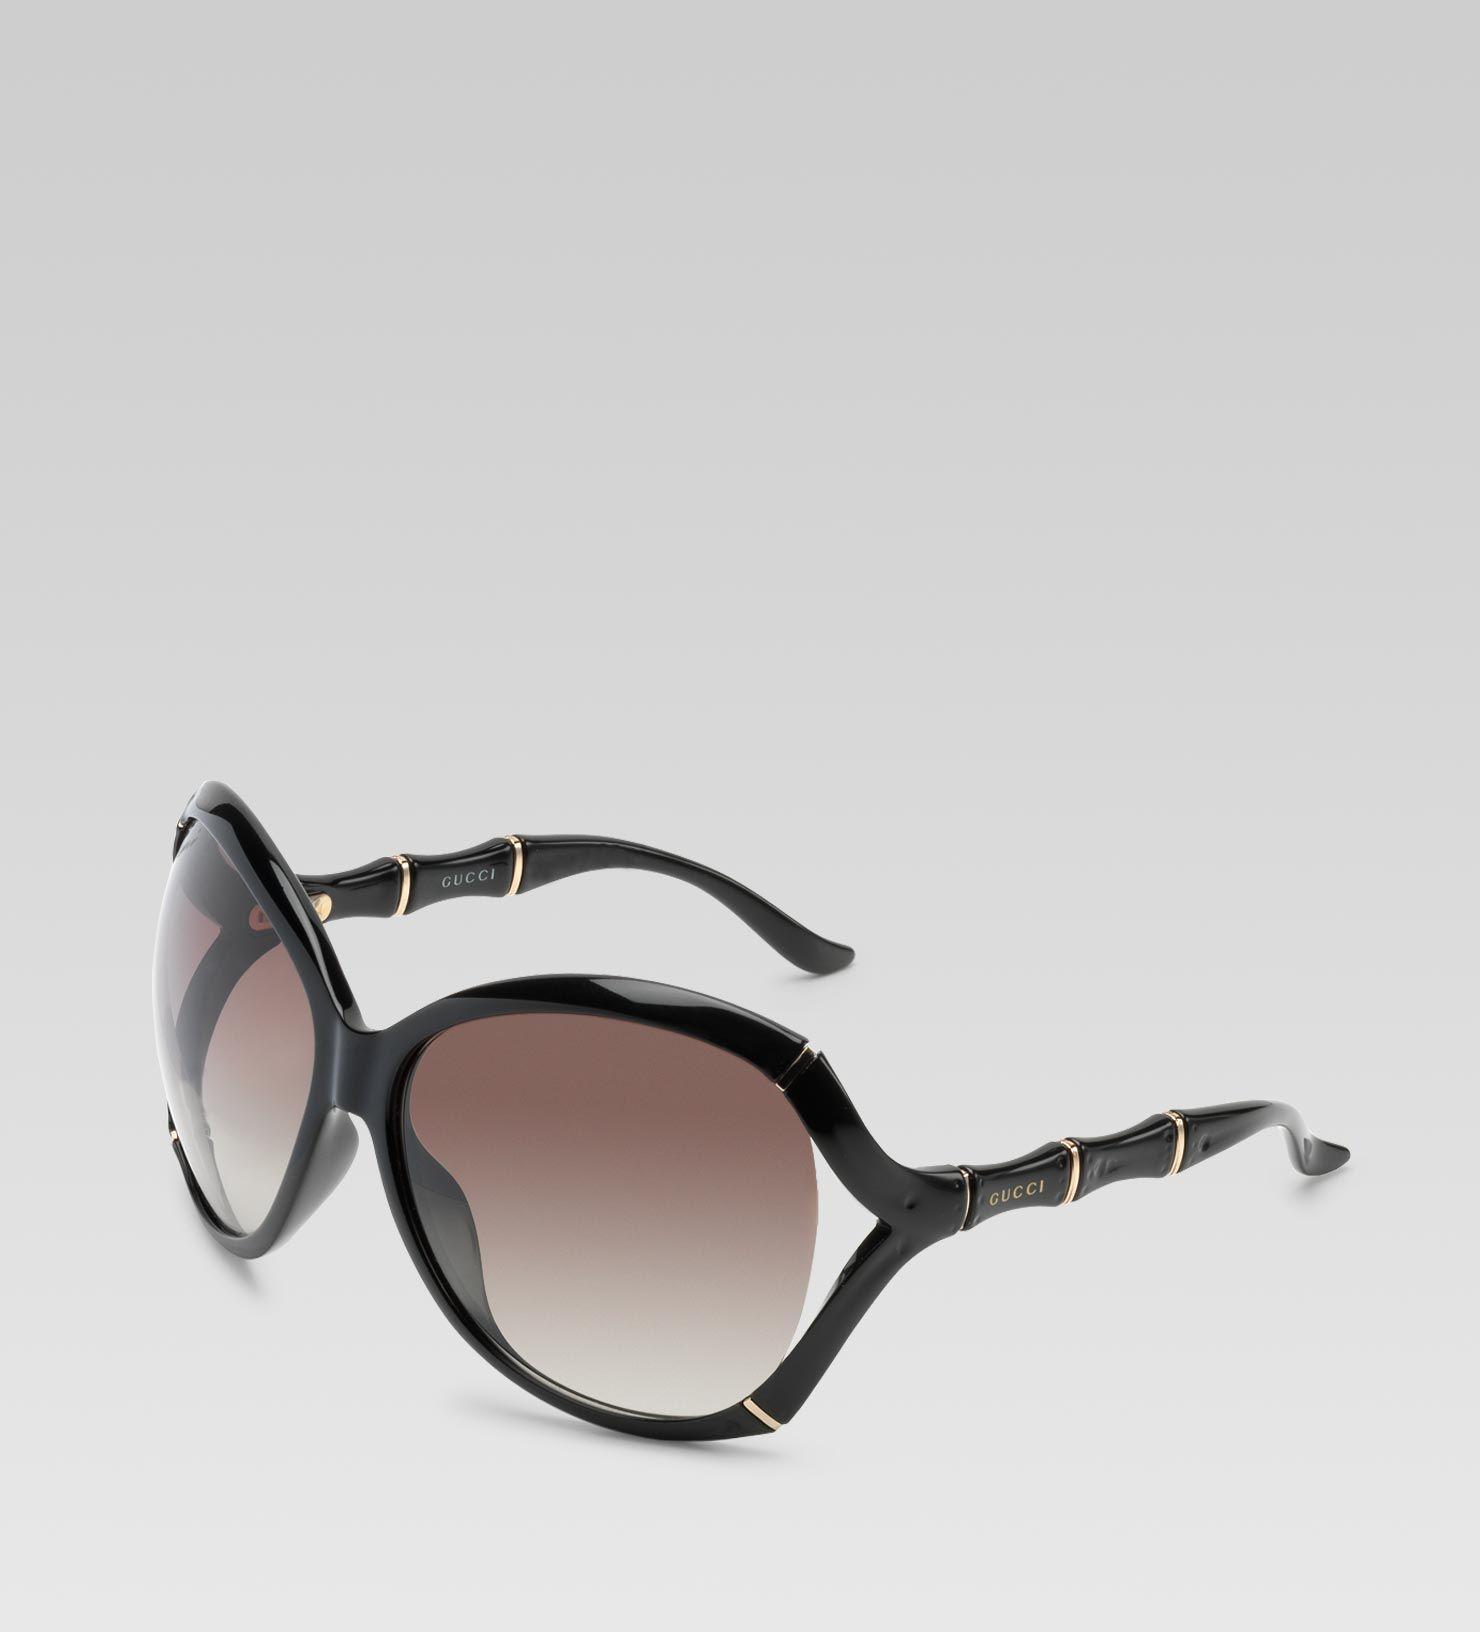 6950a52c79f Gucci Black Bamboo Sunglasses   OBSESSED!